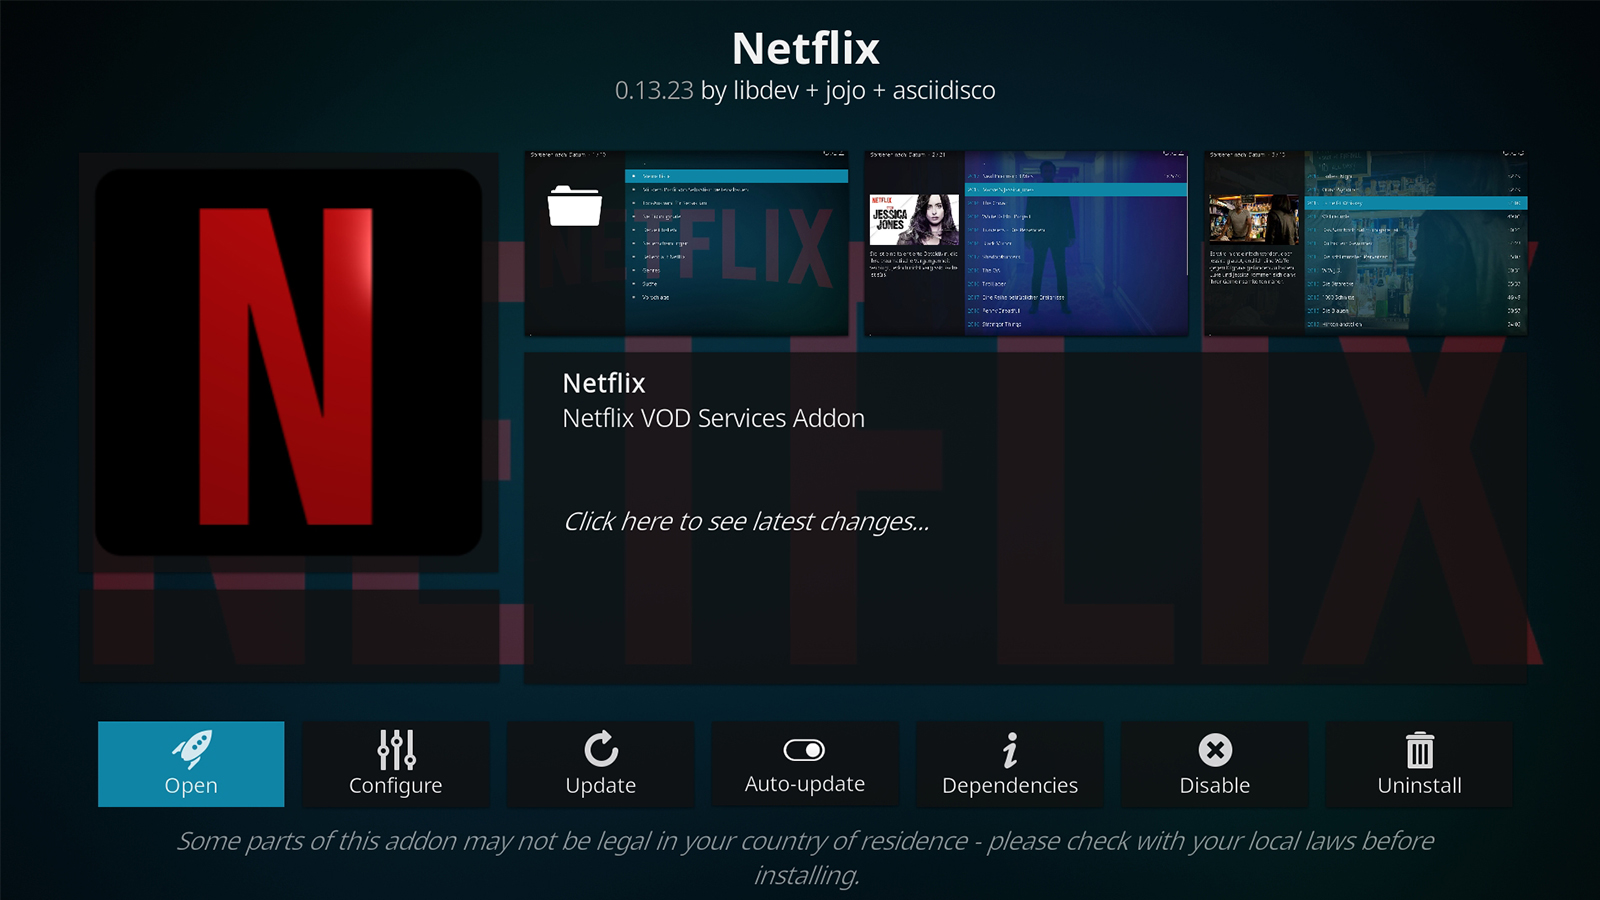 How to Install Netflix on Kodi in 8 Simple Steps | TechNadu